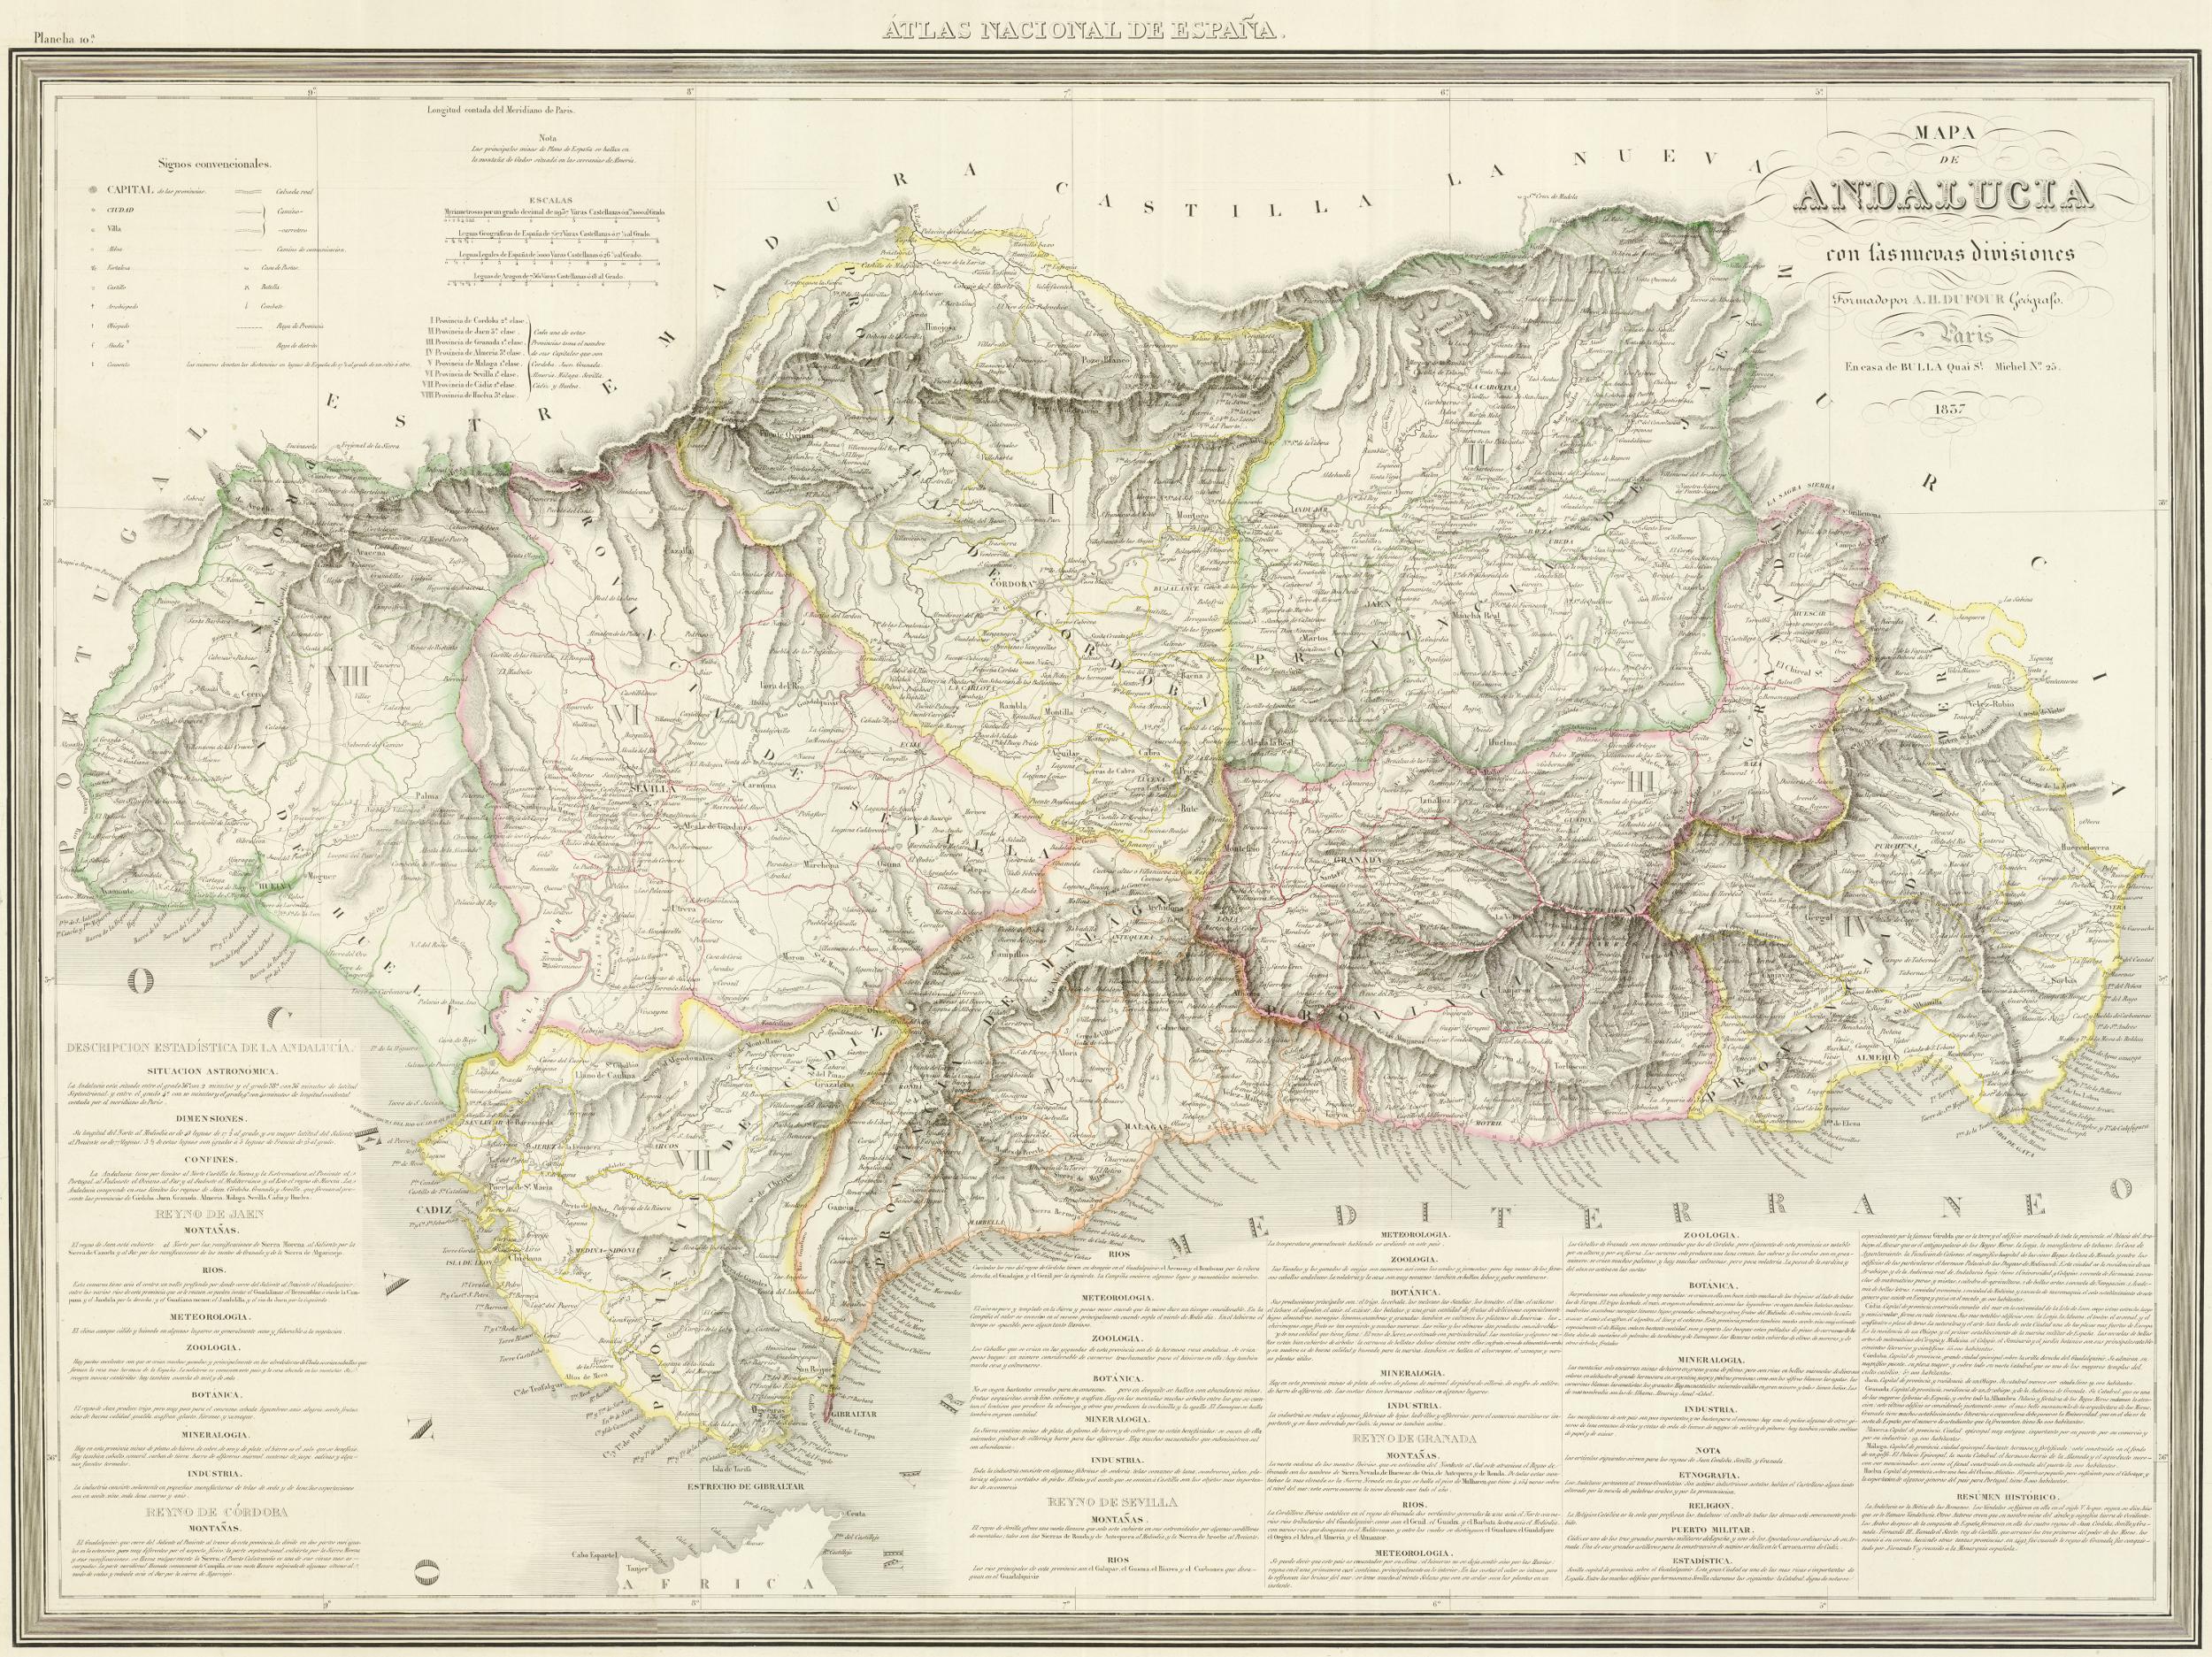 Provincias andaluzas 1833